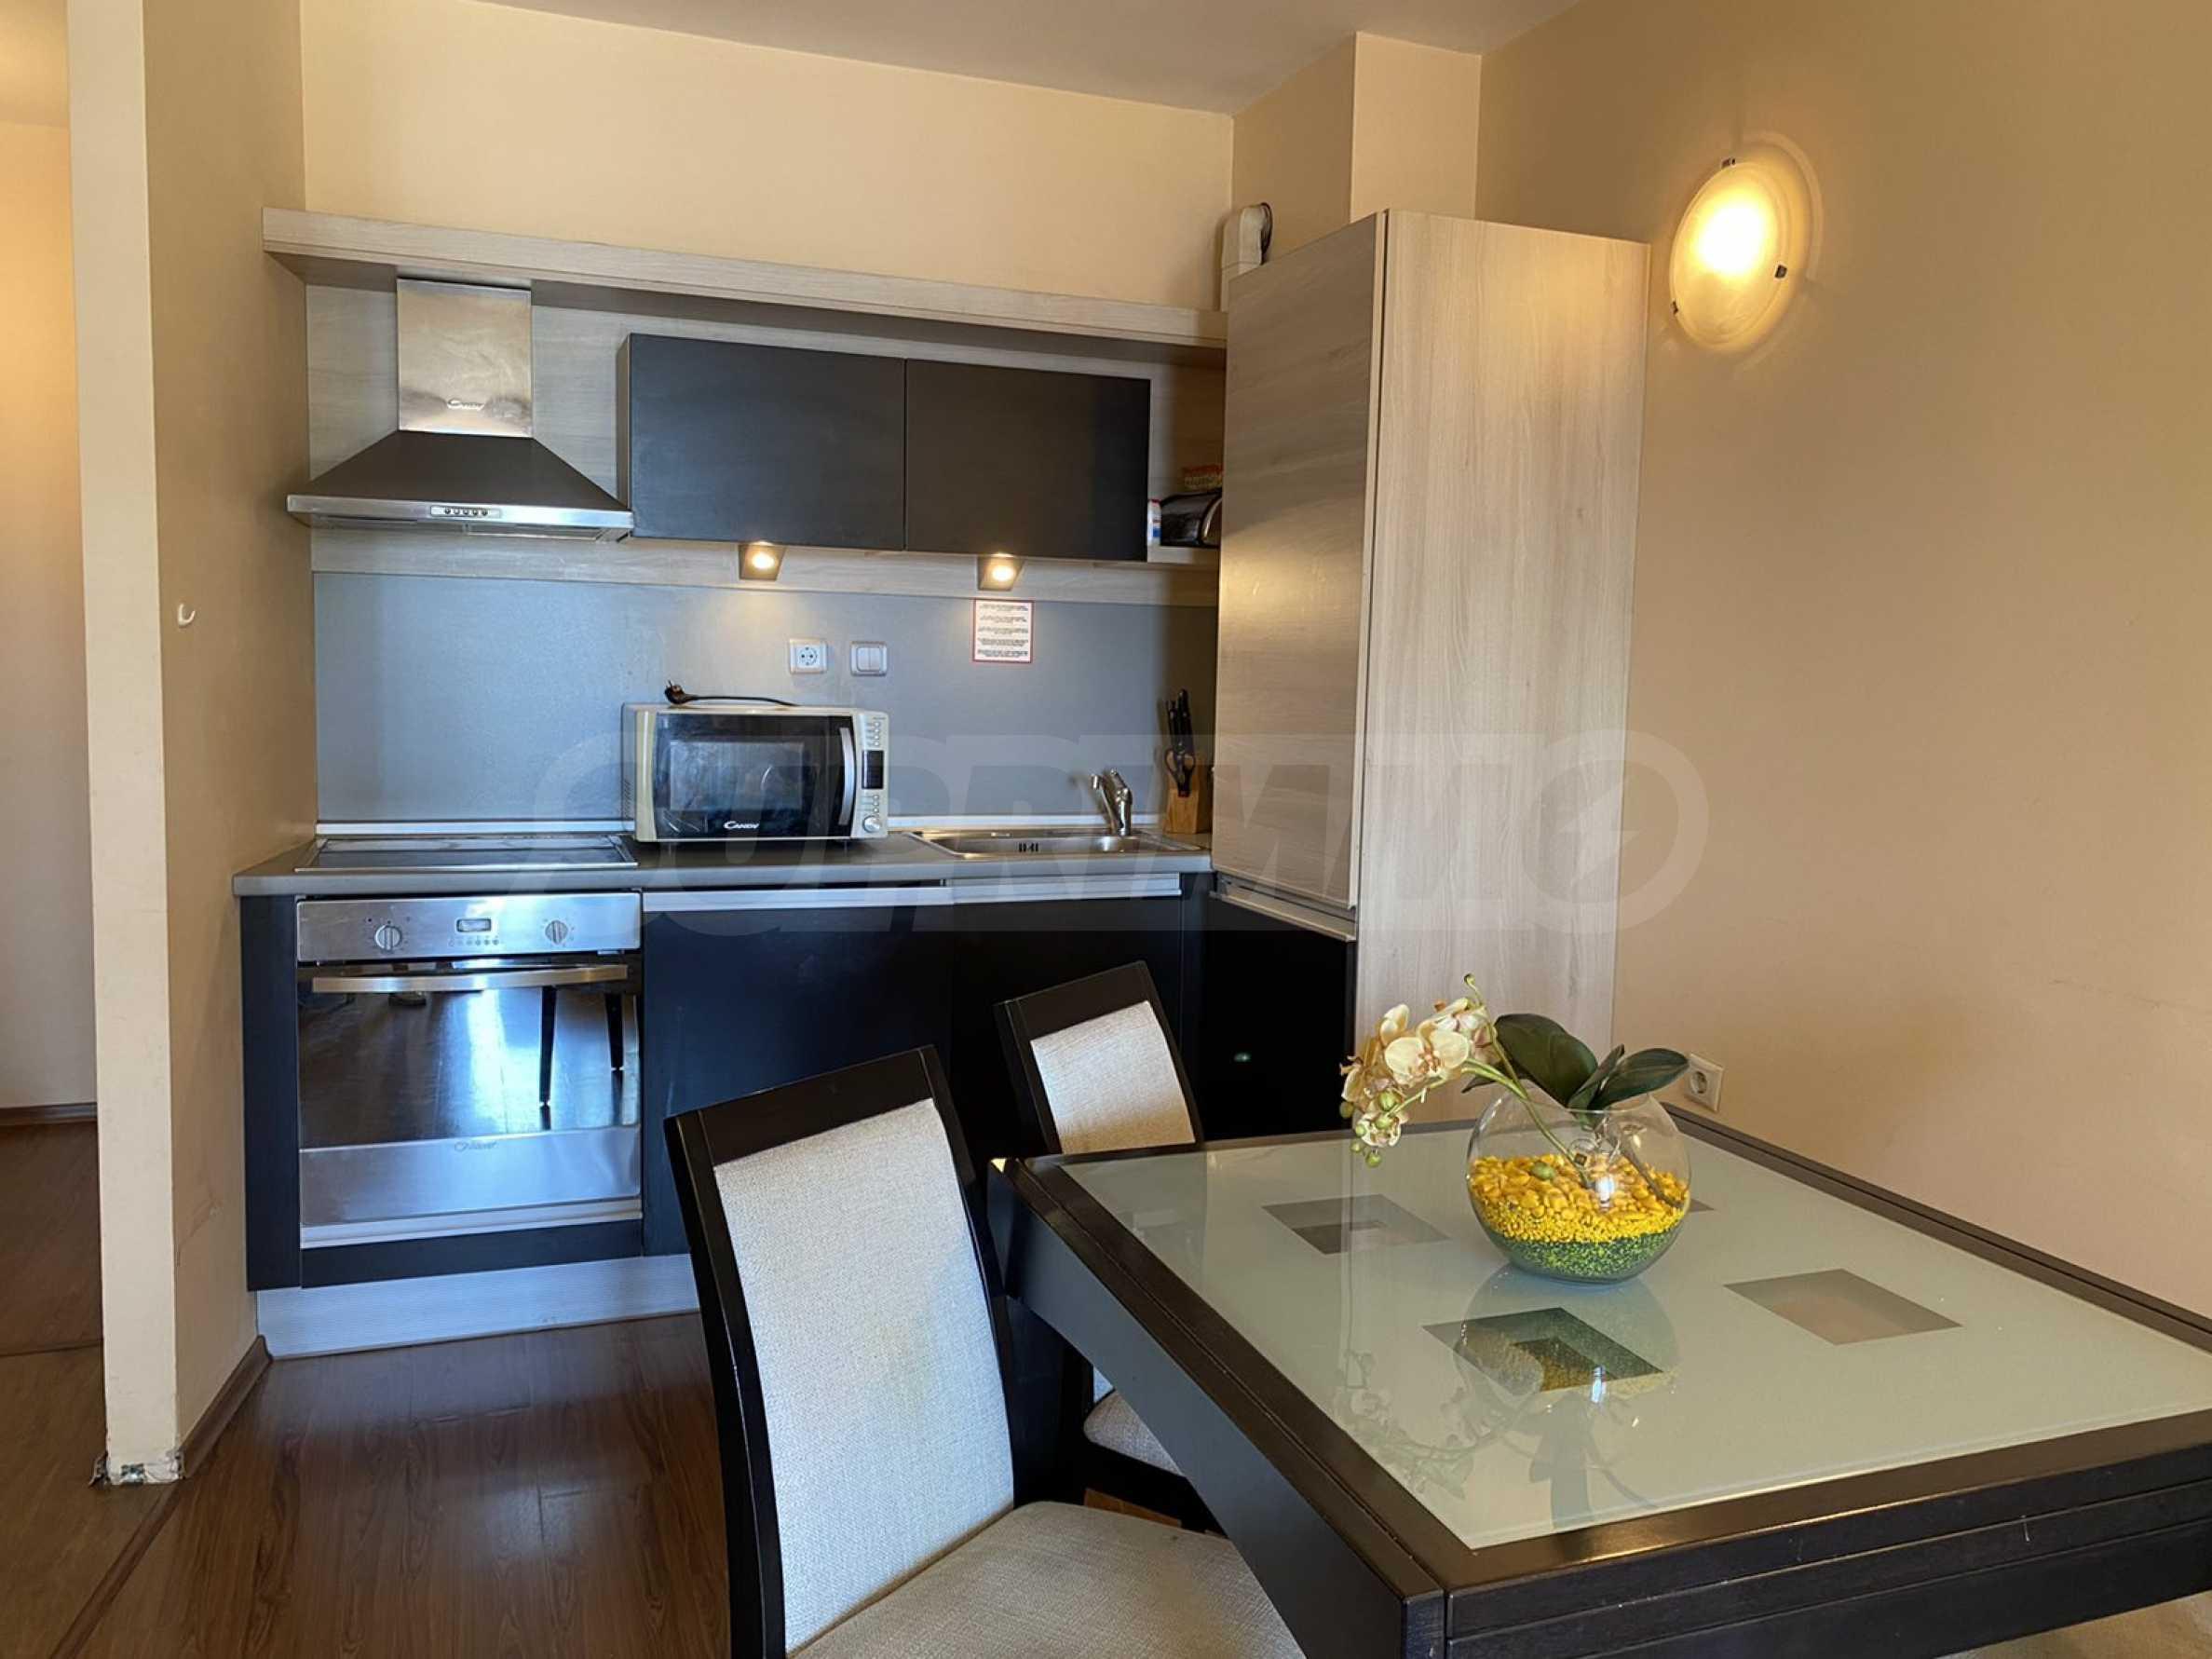 1-bedroom apartment Duralek  4